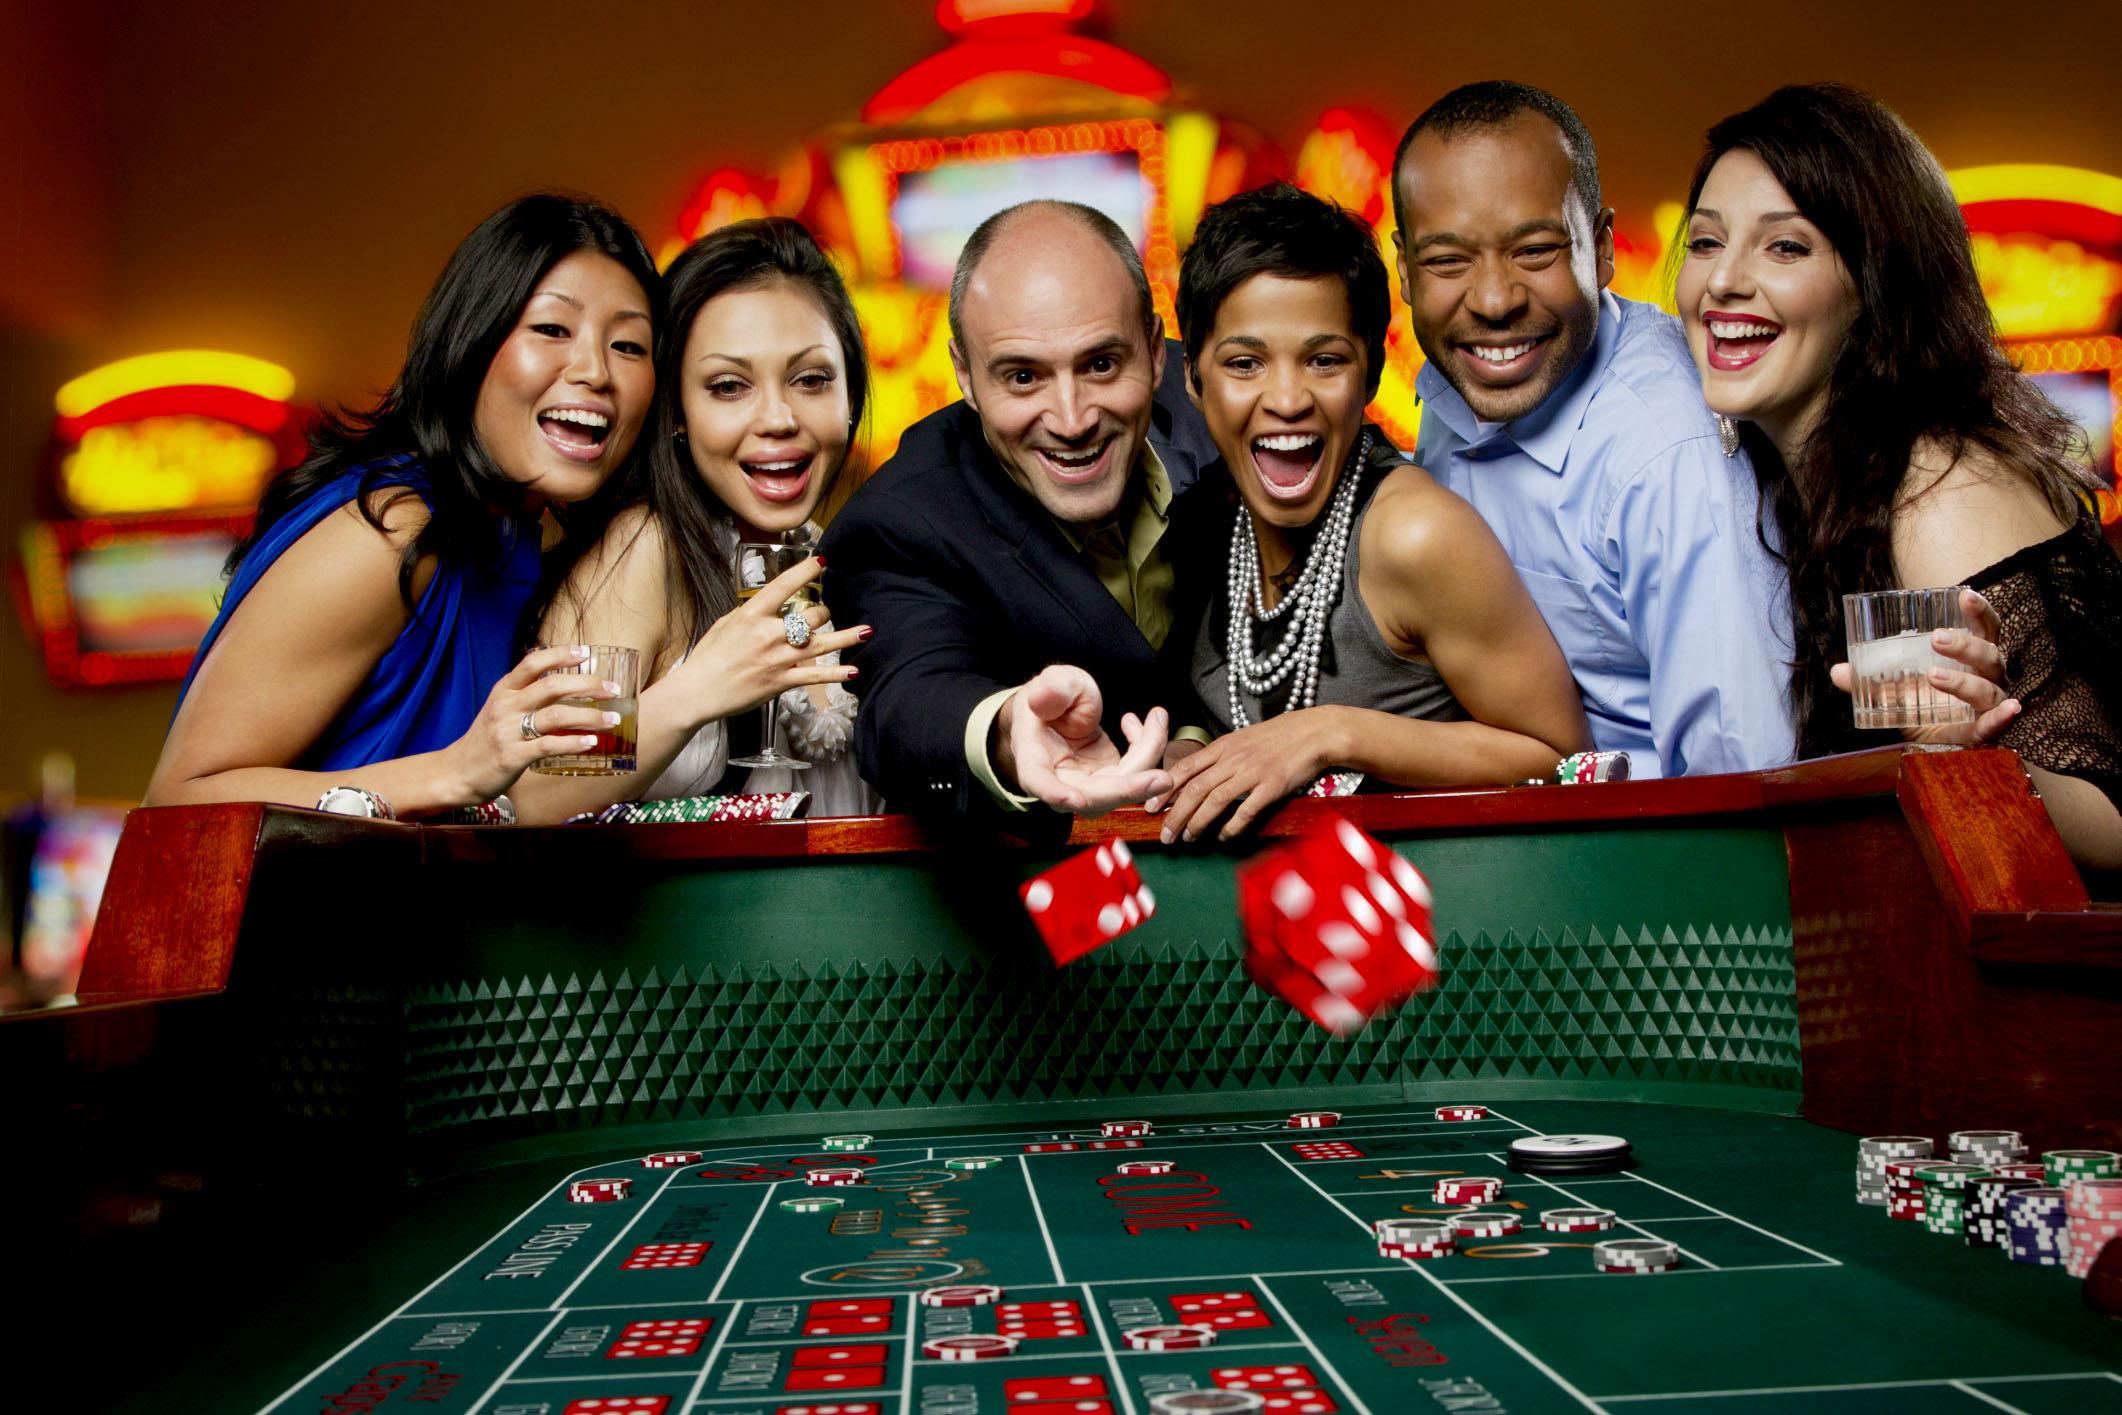 Gambling craps at a casino